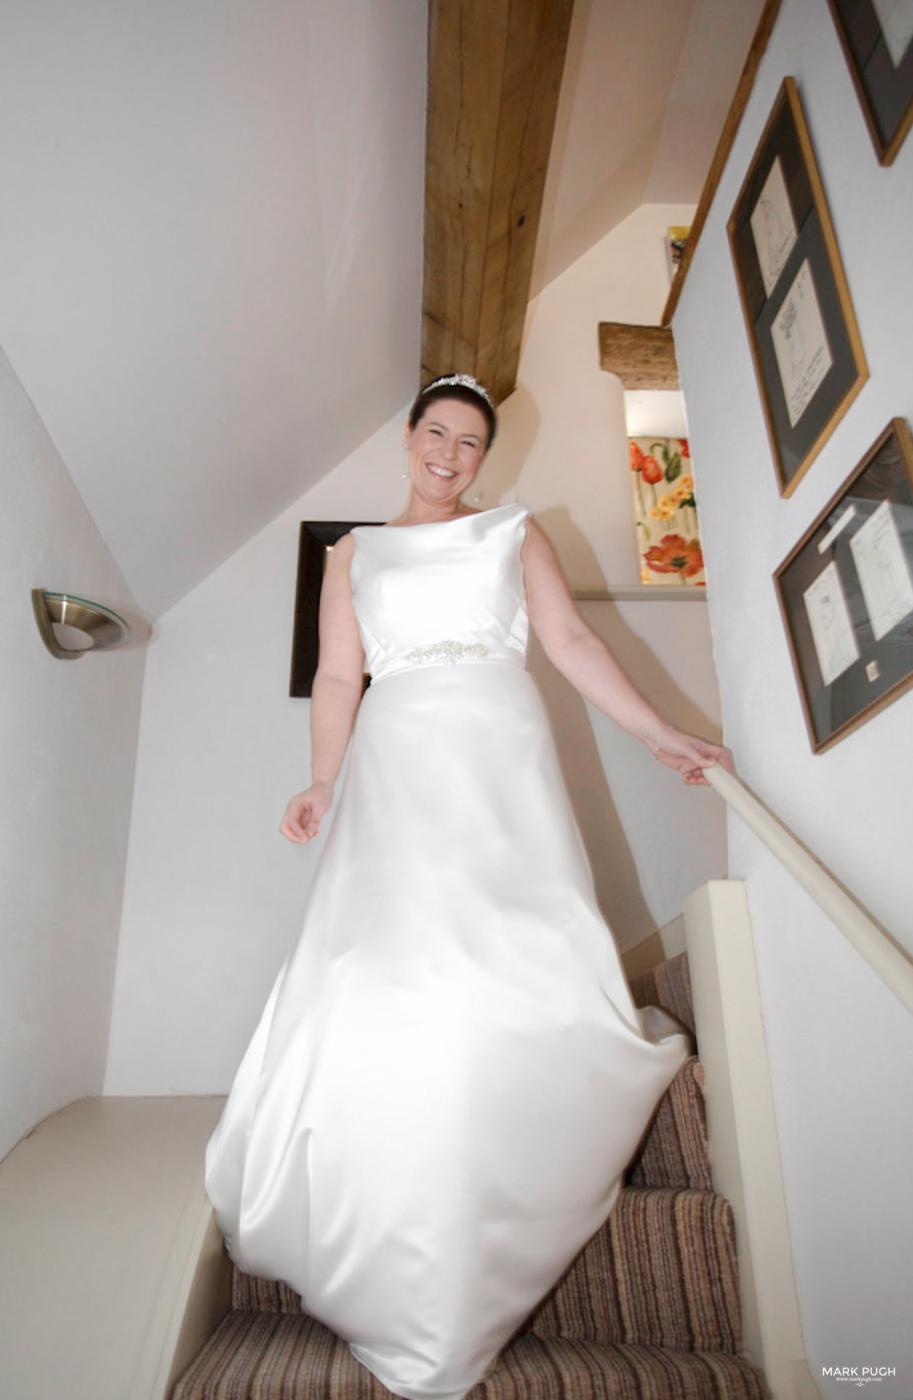 032  - Helen and Tim - Wedding Photography at Chatsworth House Bakewell Derbyshire DE45 1PP - Wedding Photographer Mark Pugh www.markpugh.com -105.JPG